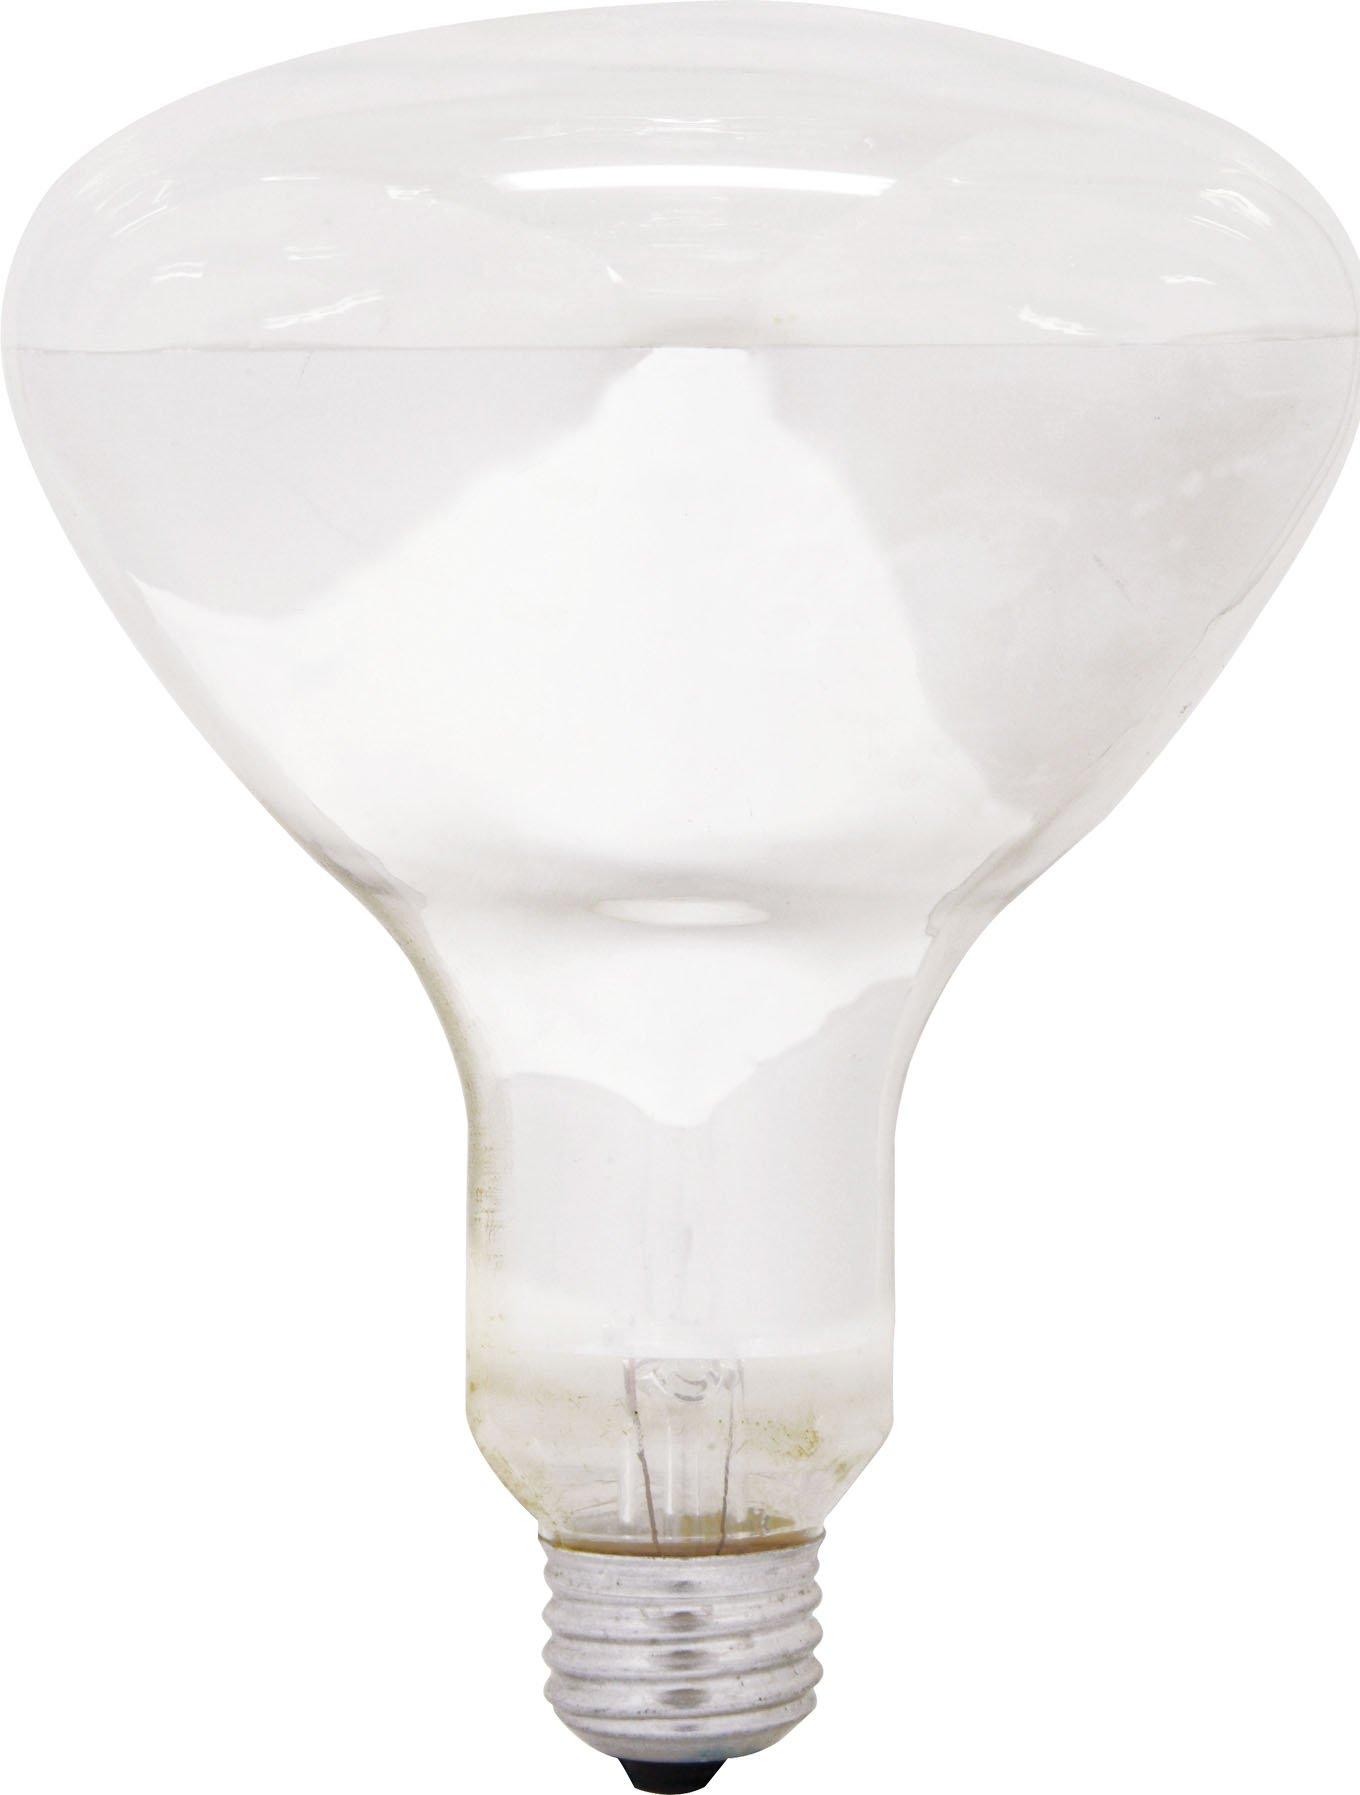 GE Lighting 80940 65-Watt 640-Lumen Track and Recessed R30 Incandescent Light Bulb, Soft White, 6-Pack